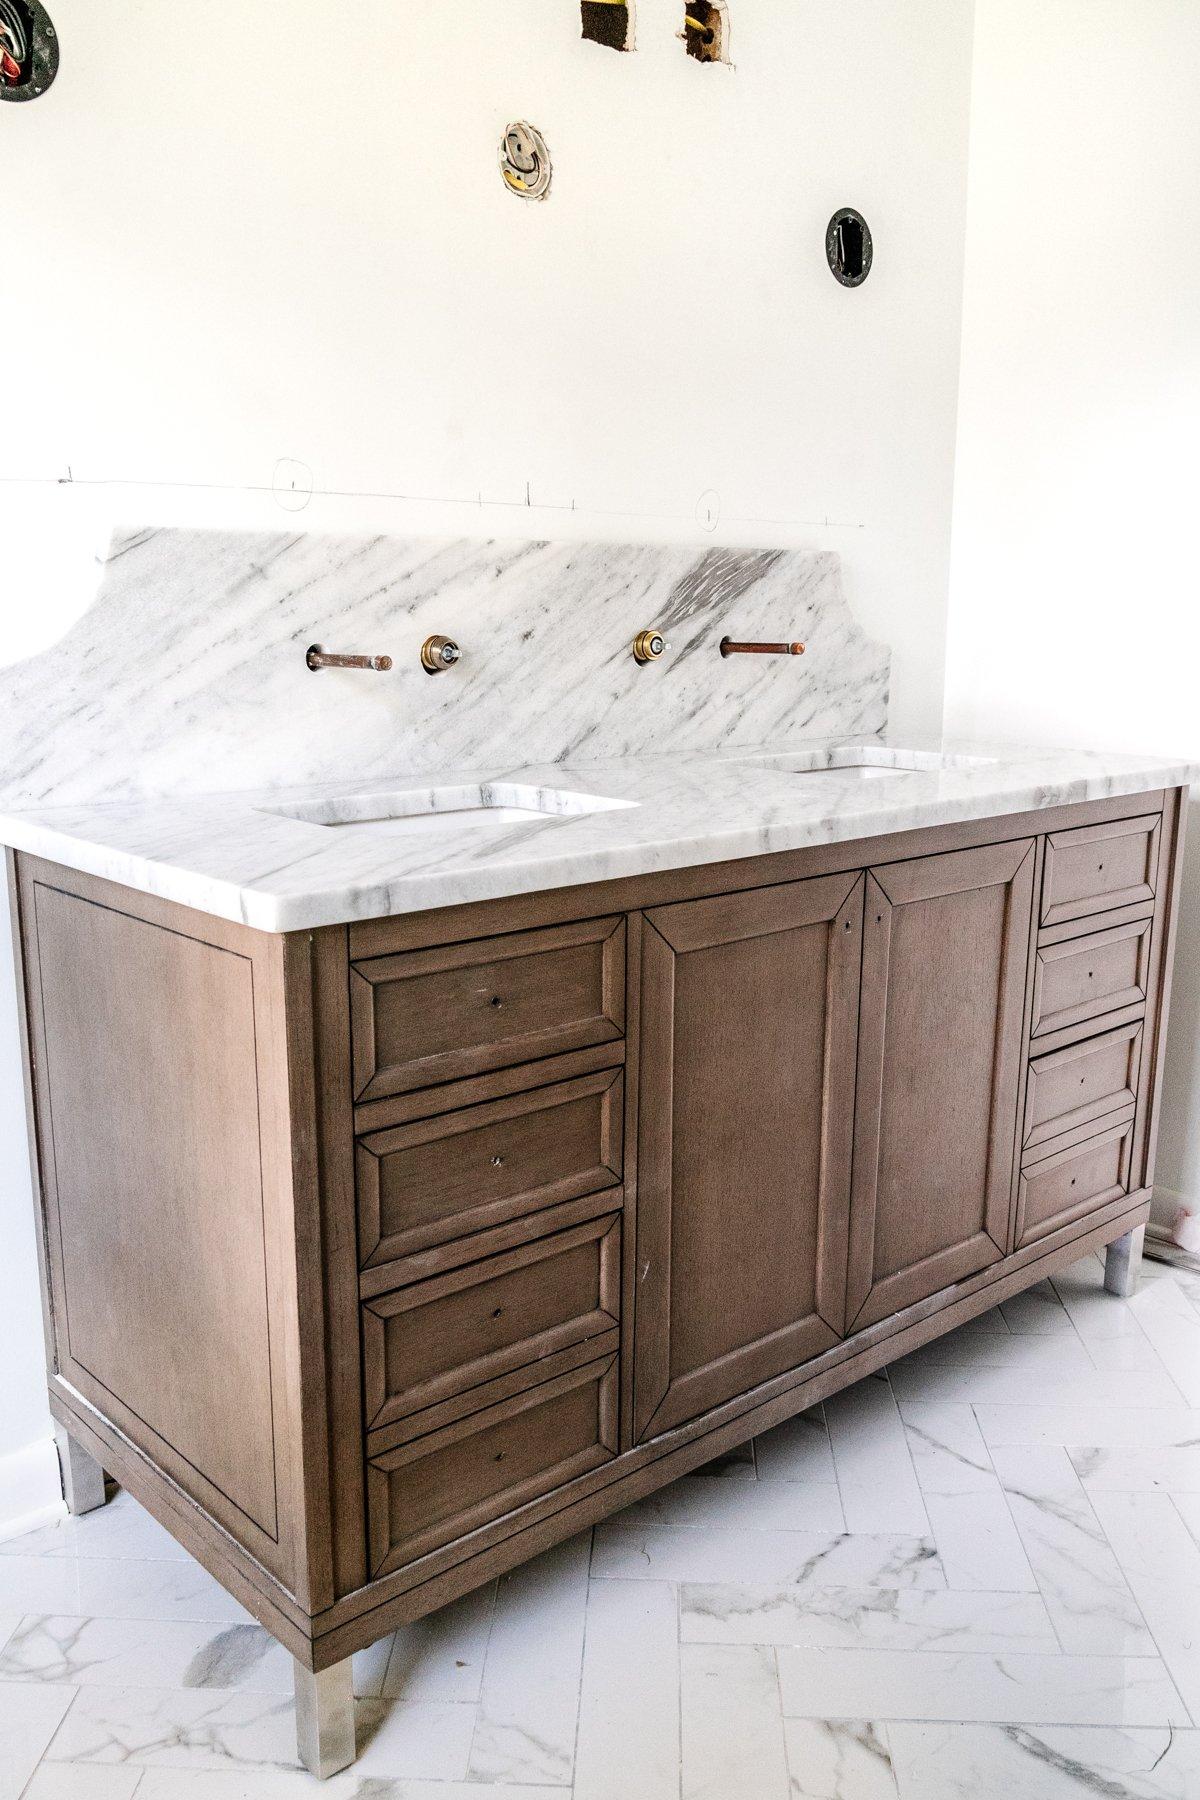 wood vanity with scalloped marble backsplash and herringbone tile